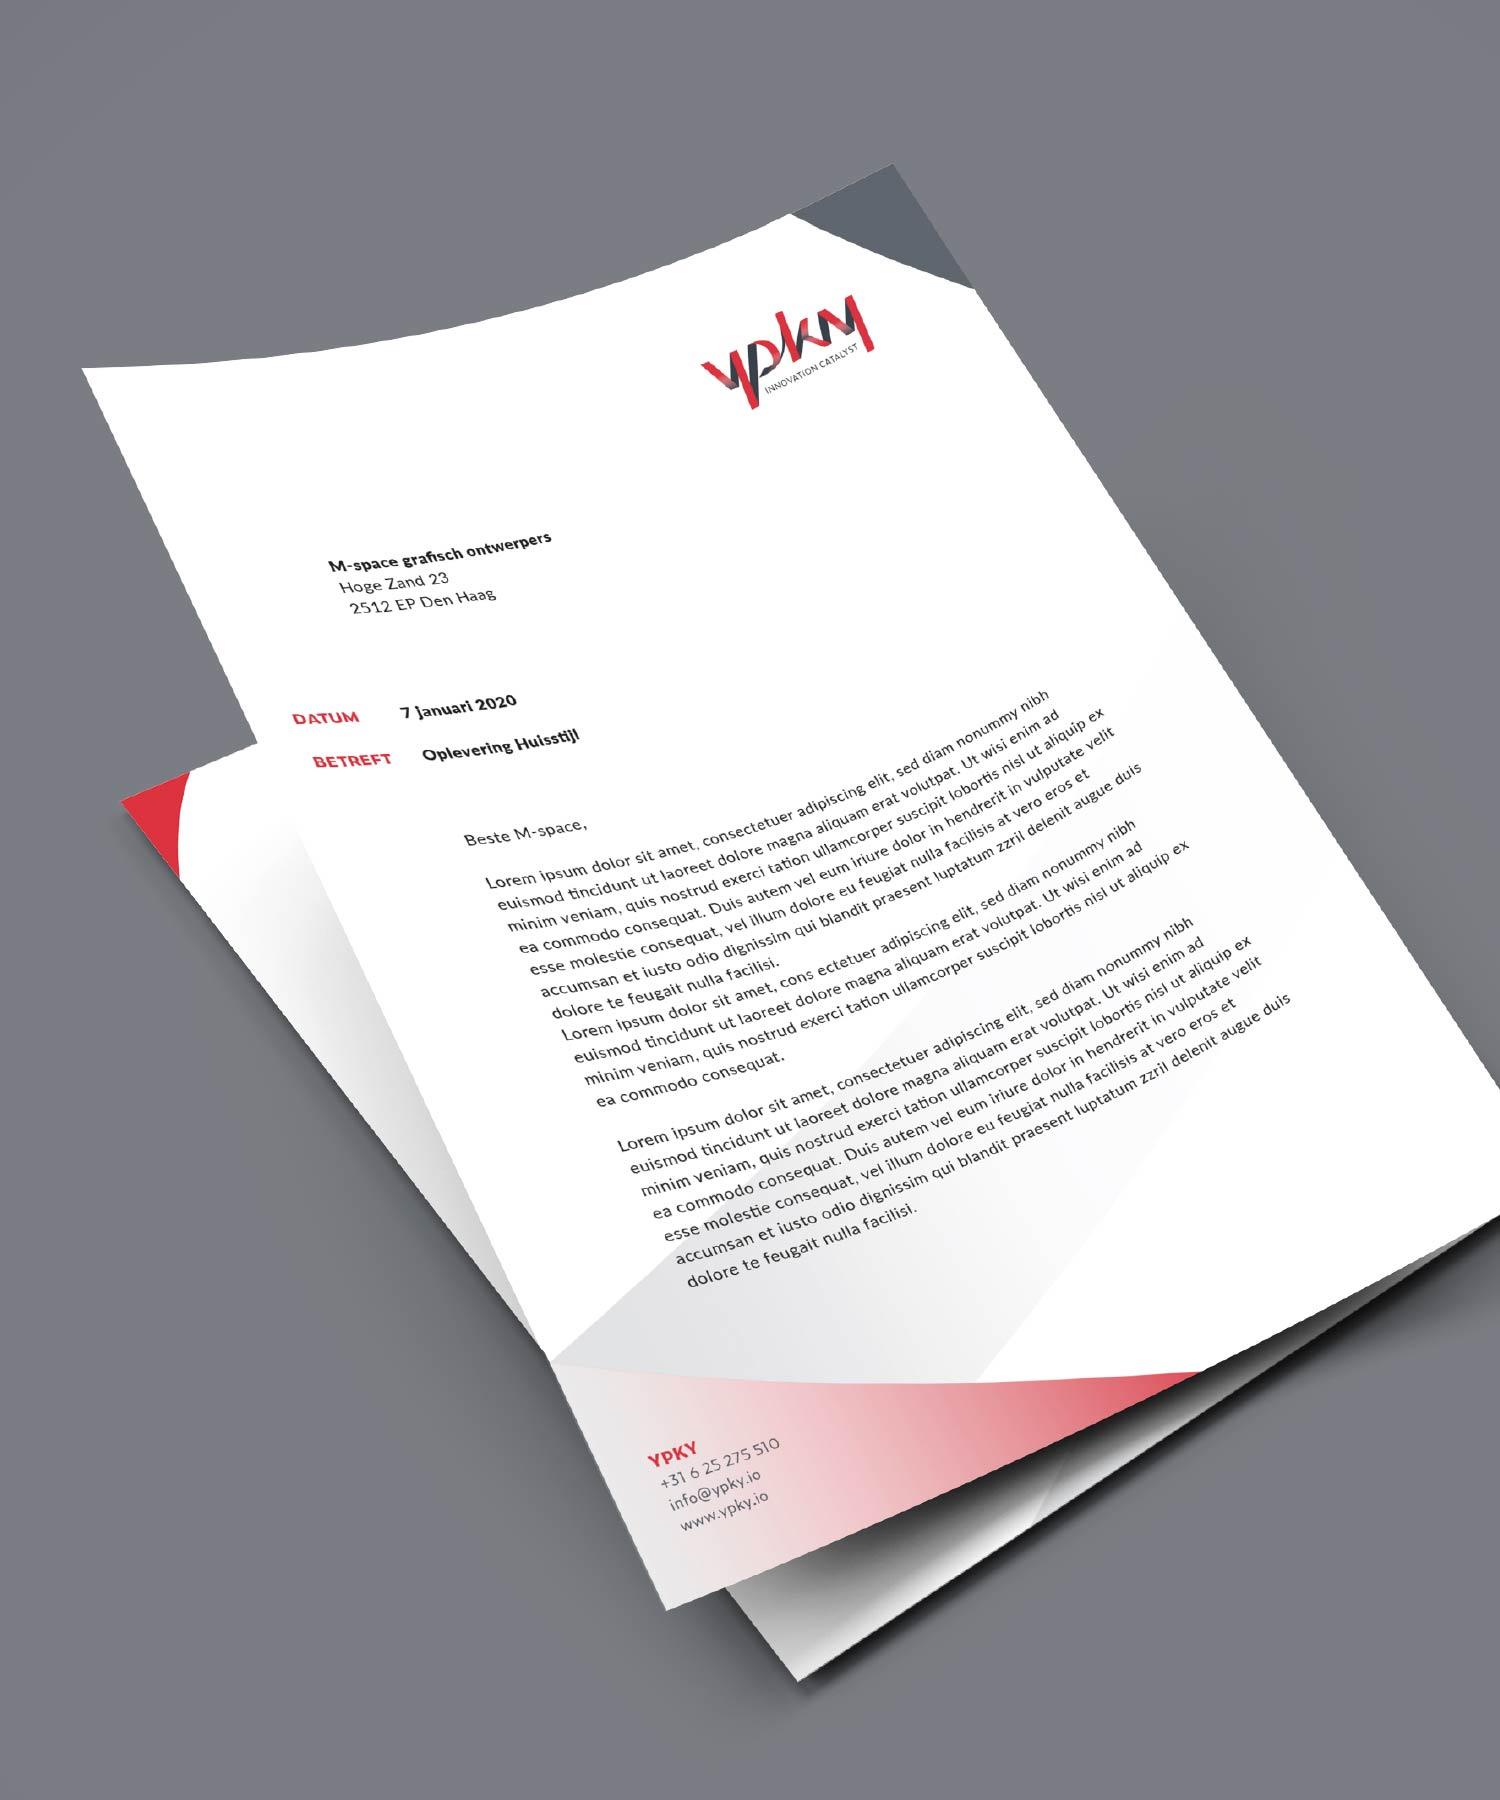 YPKY briefpapier M-space